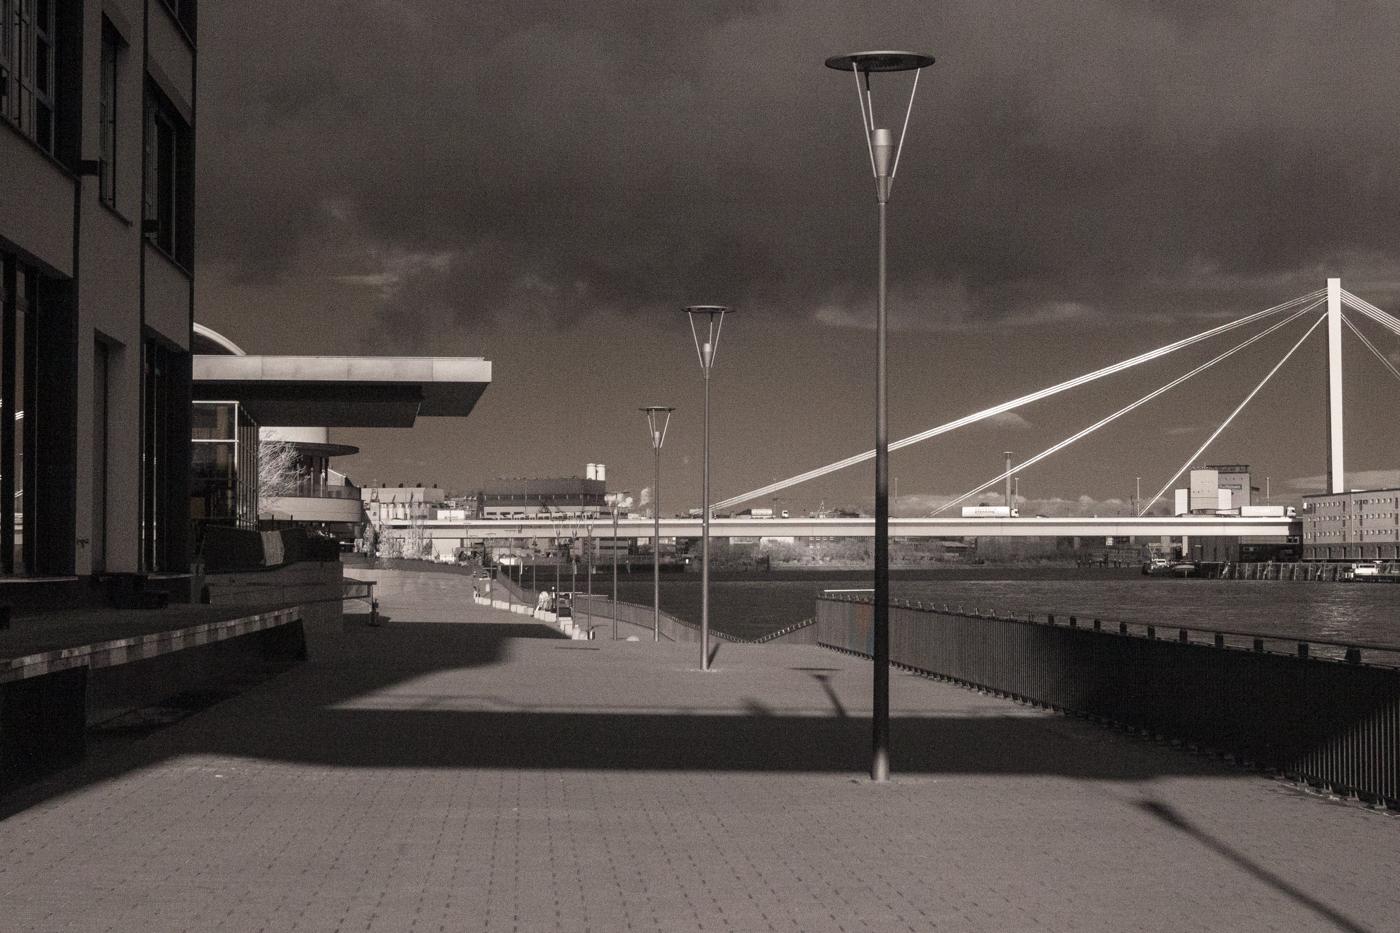 Rheinpromenade Ludwigshafen